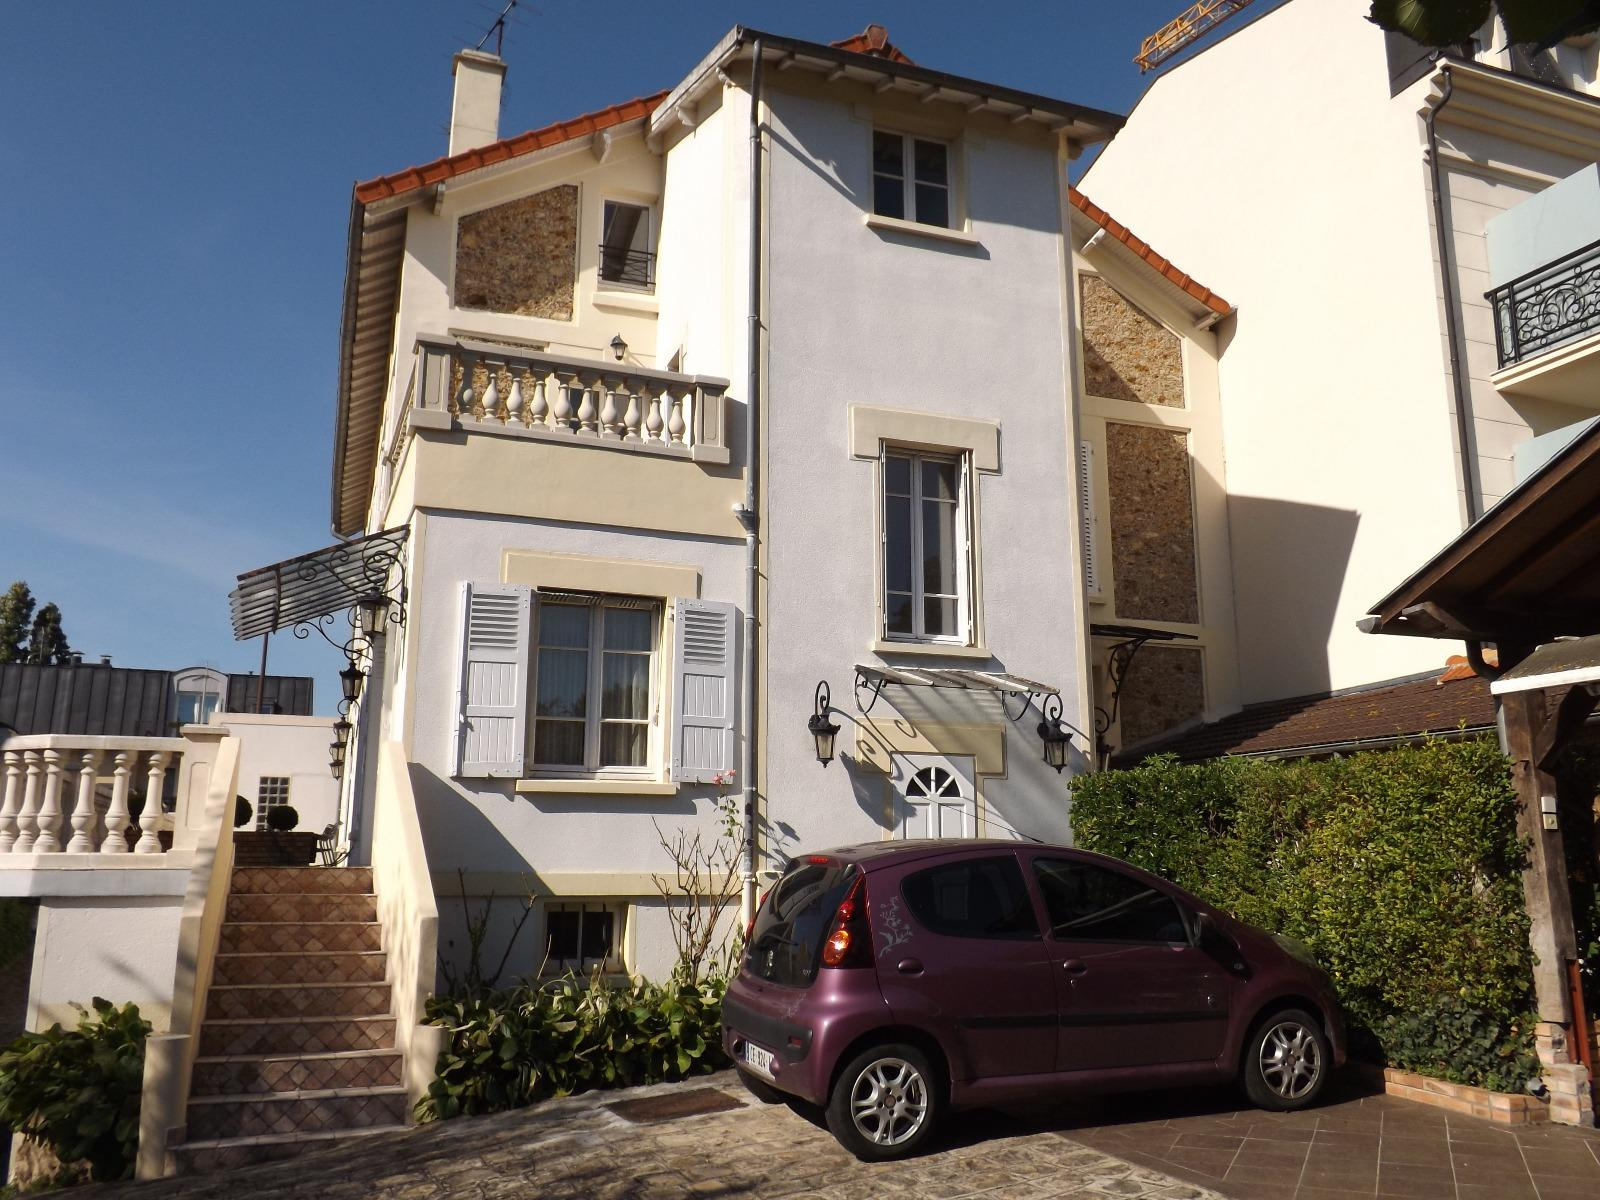 Immobilier boissy st leger vente appartement et villa for Val immobilier boissy saint leger